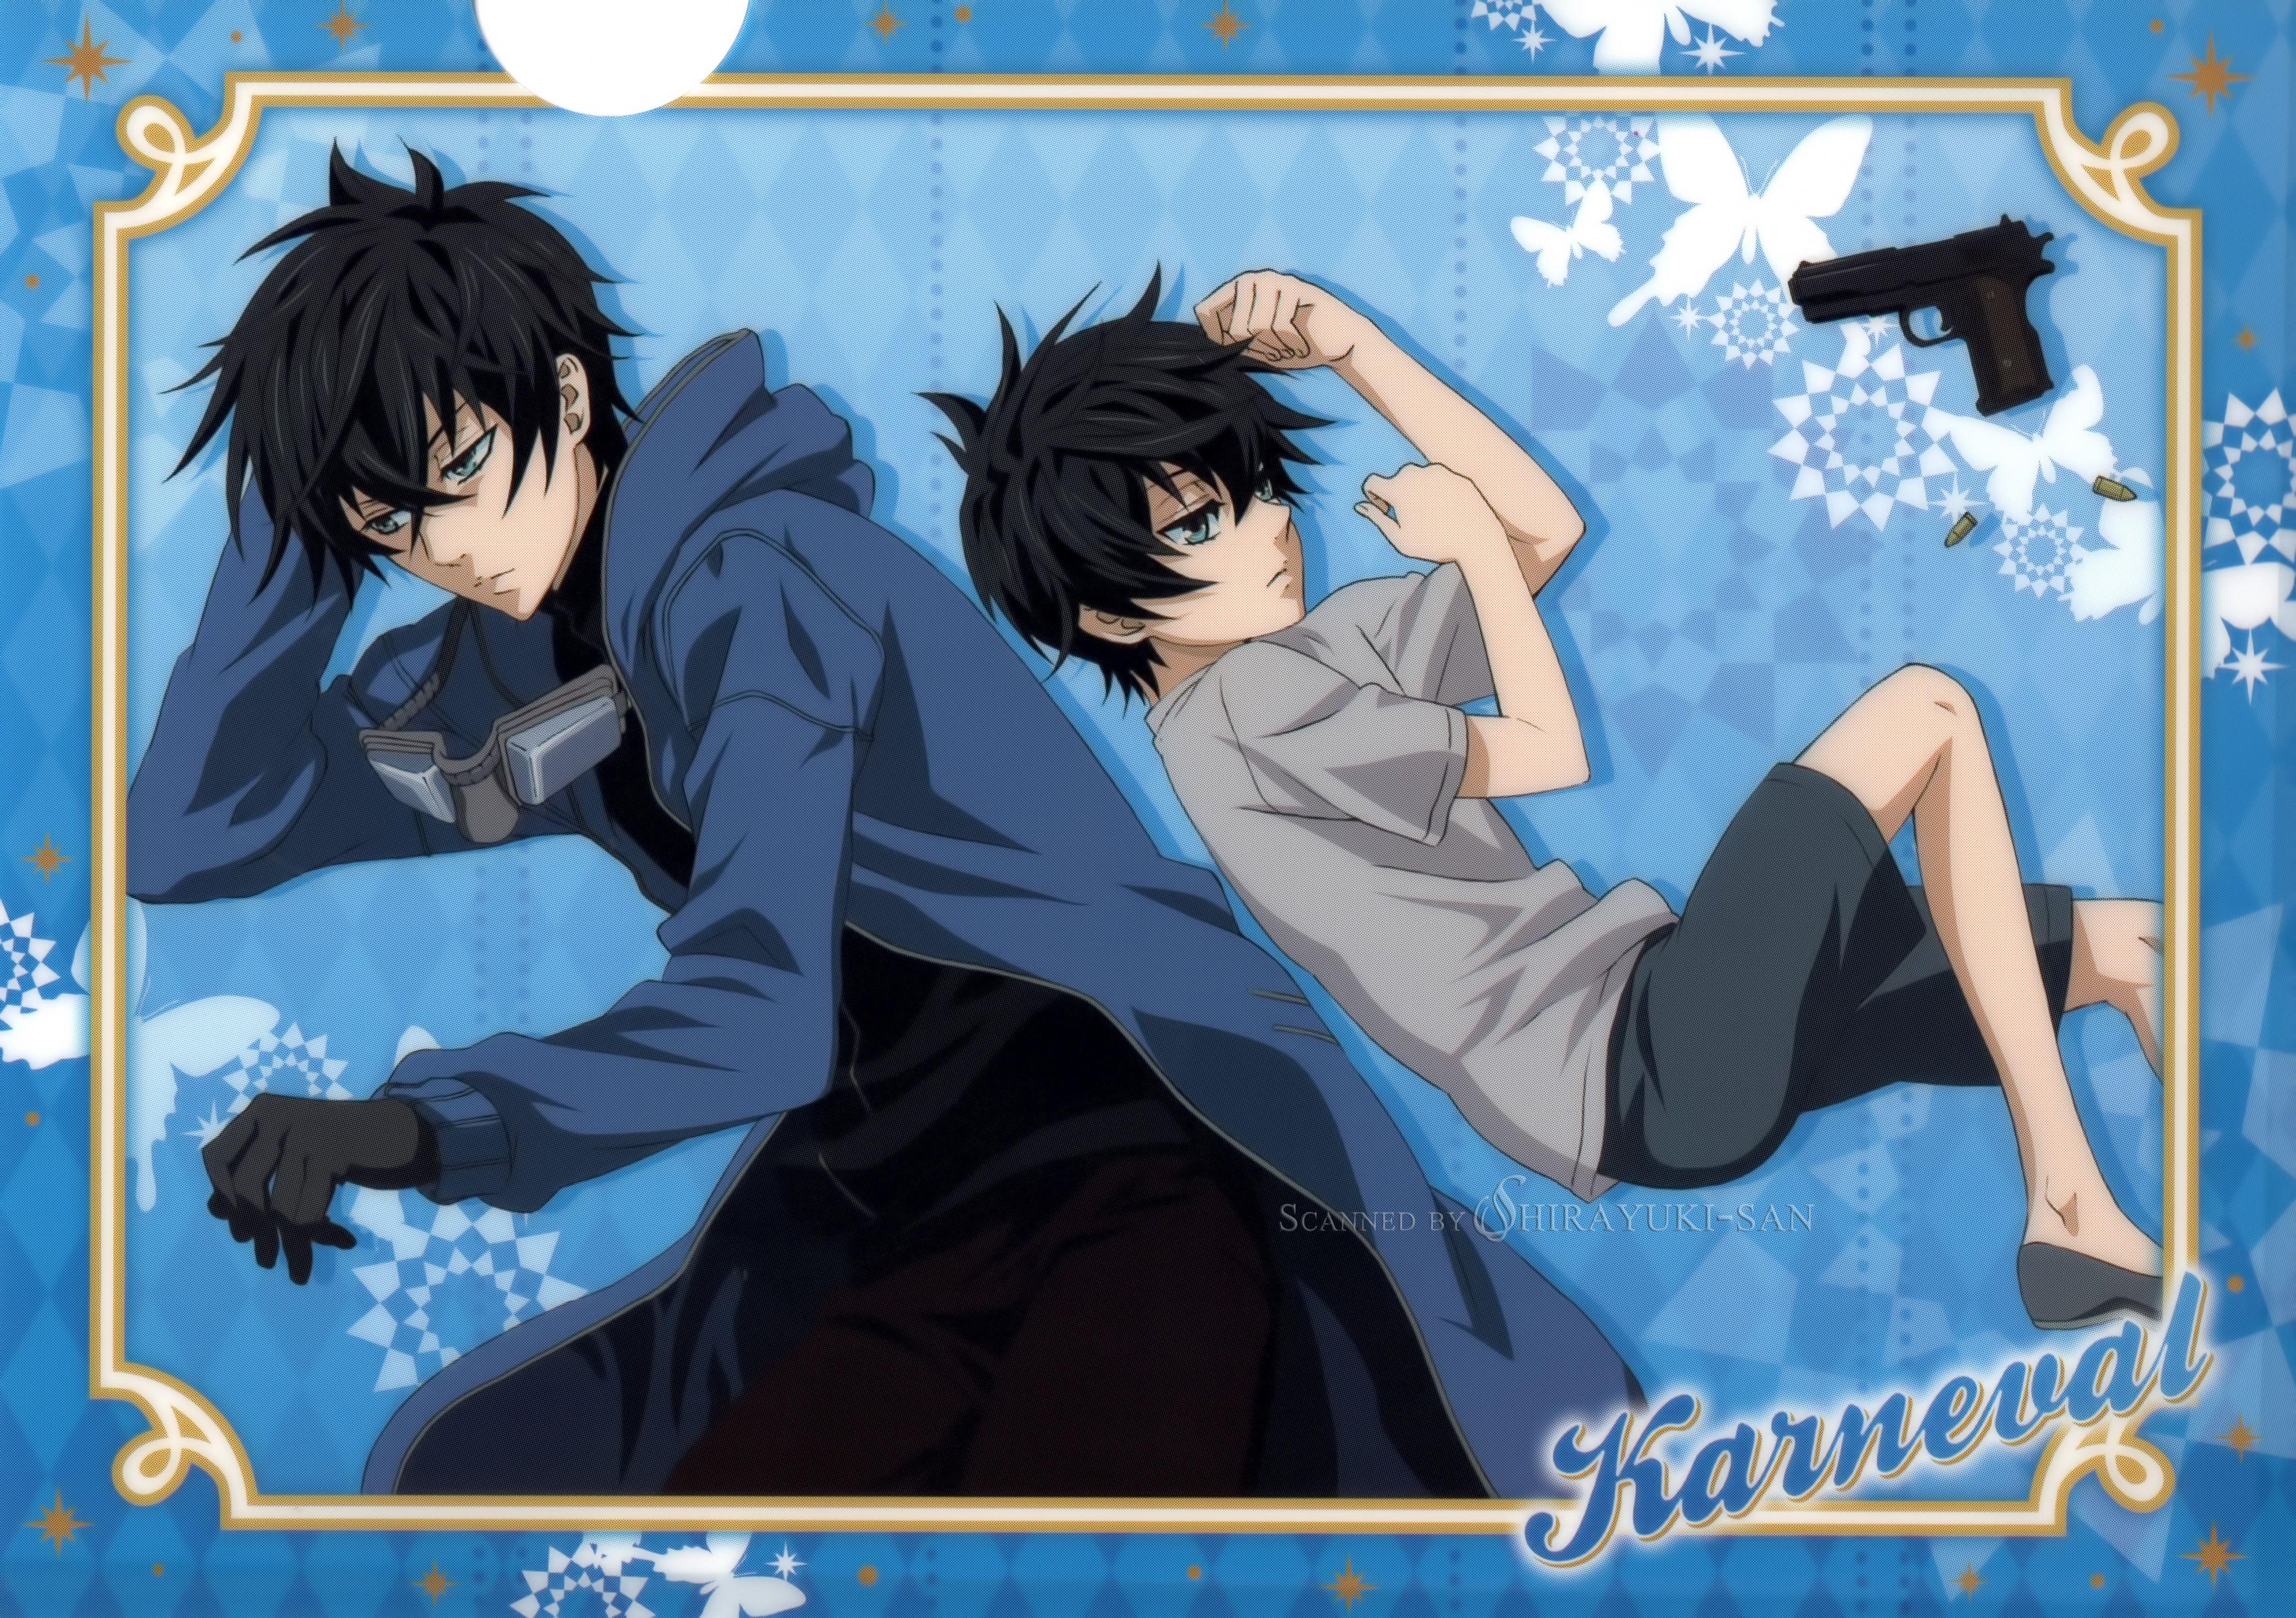 Karneval Gareki Anime, Cute anime guys, Anime chibi